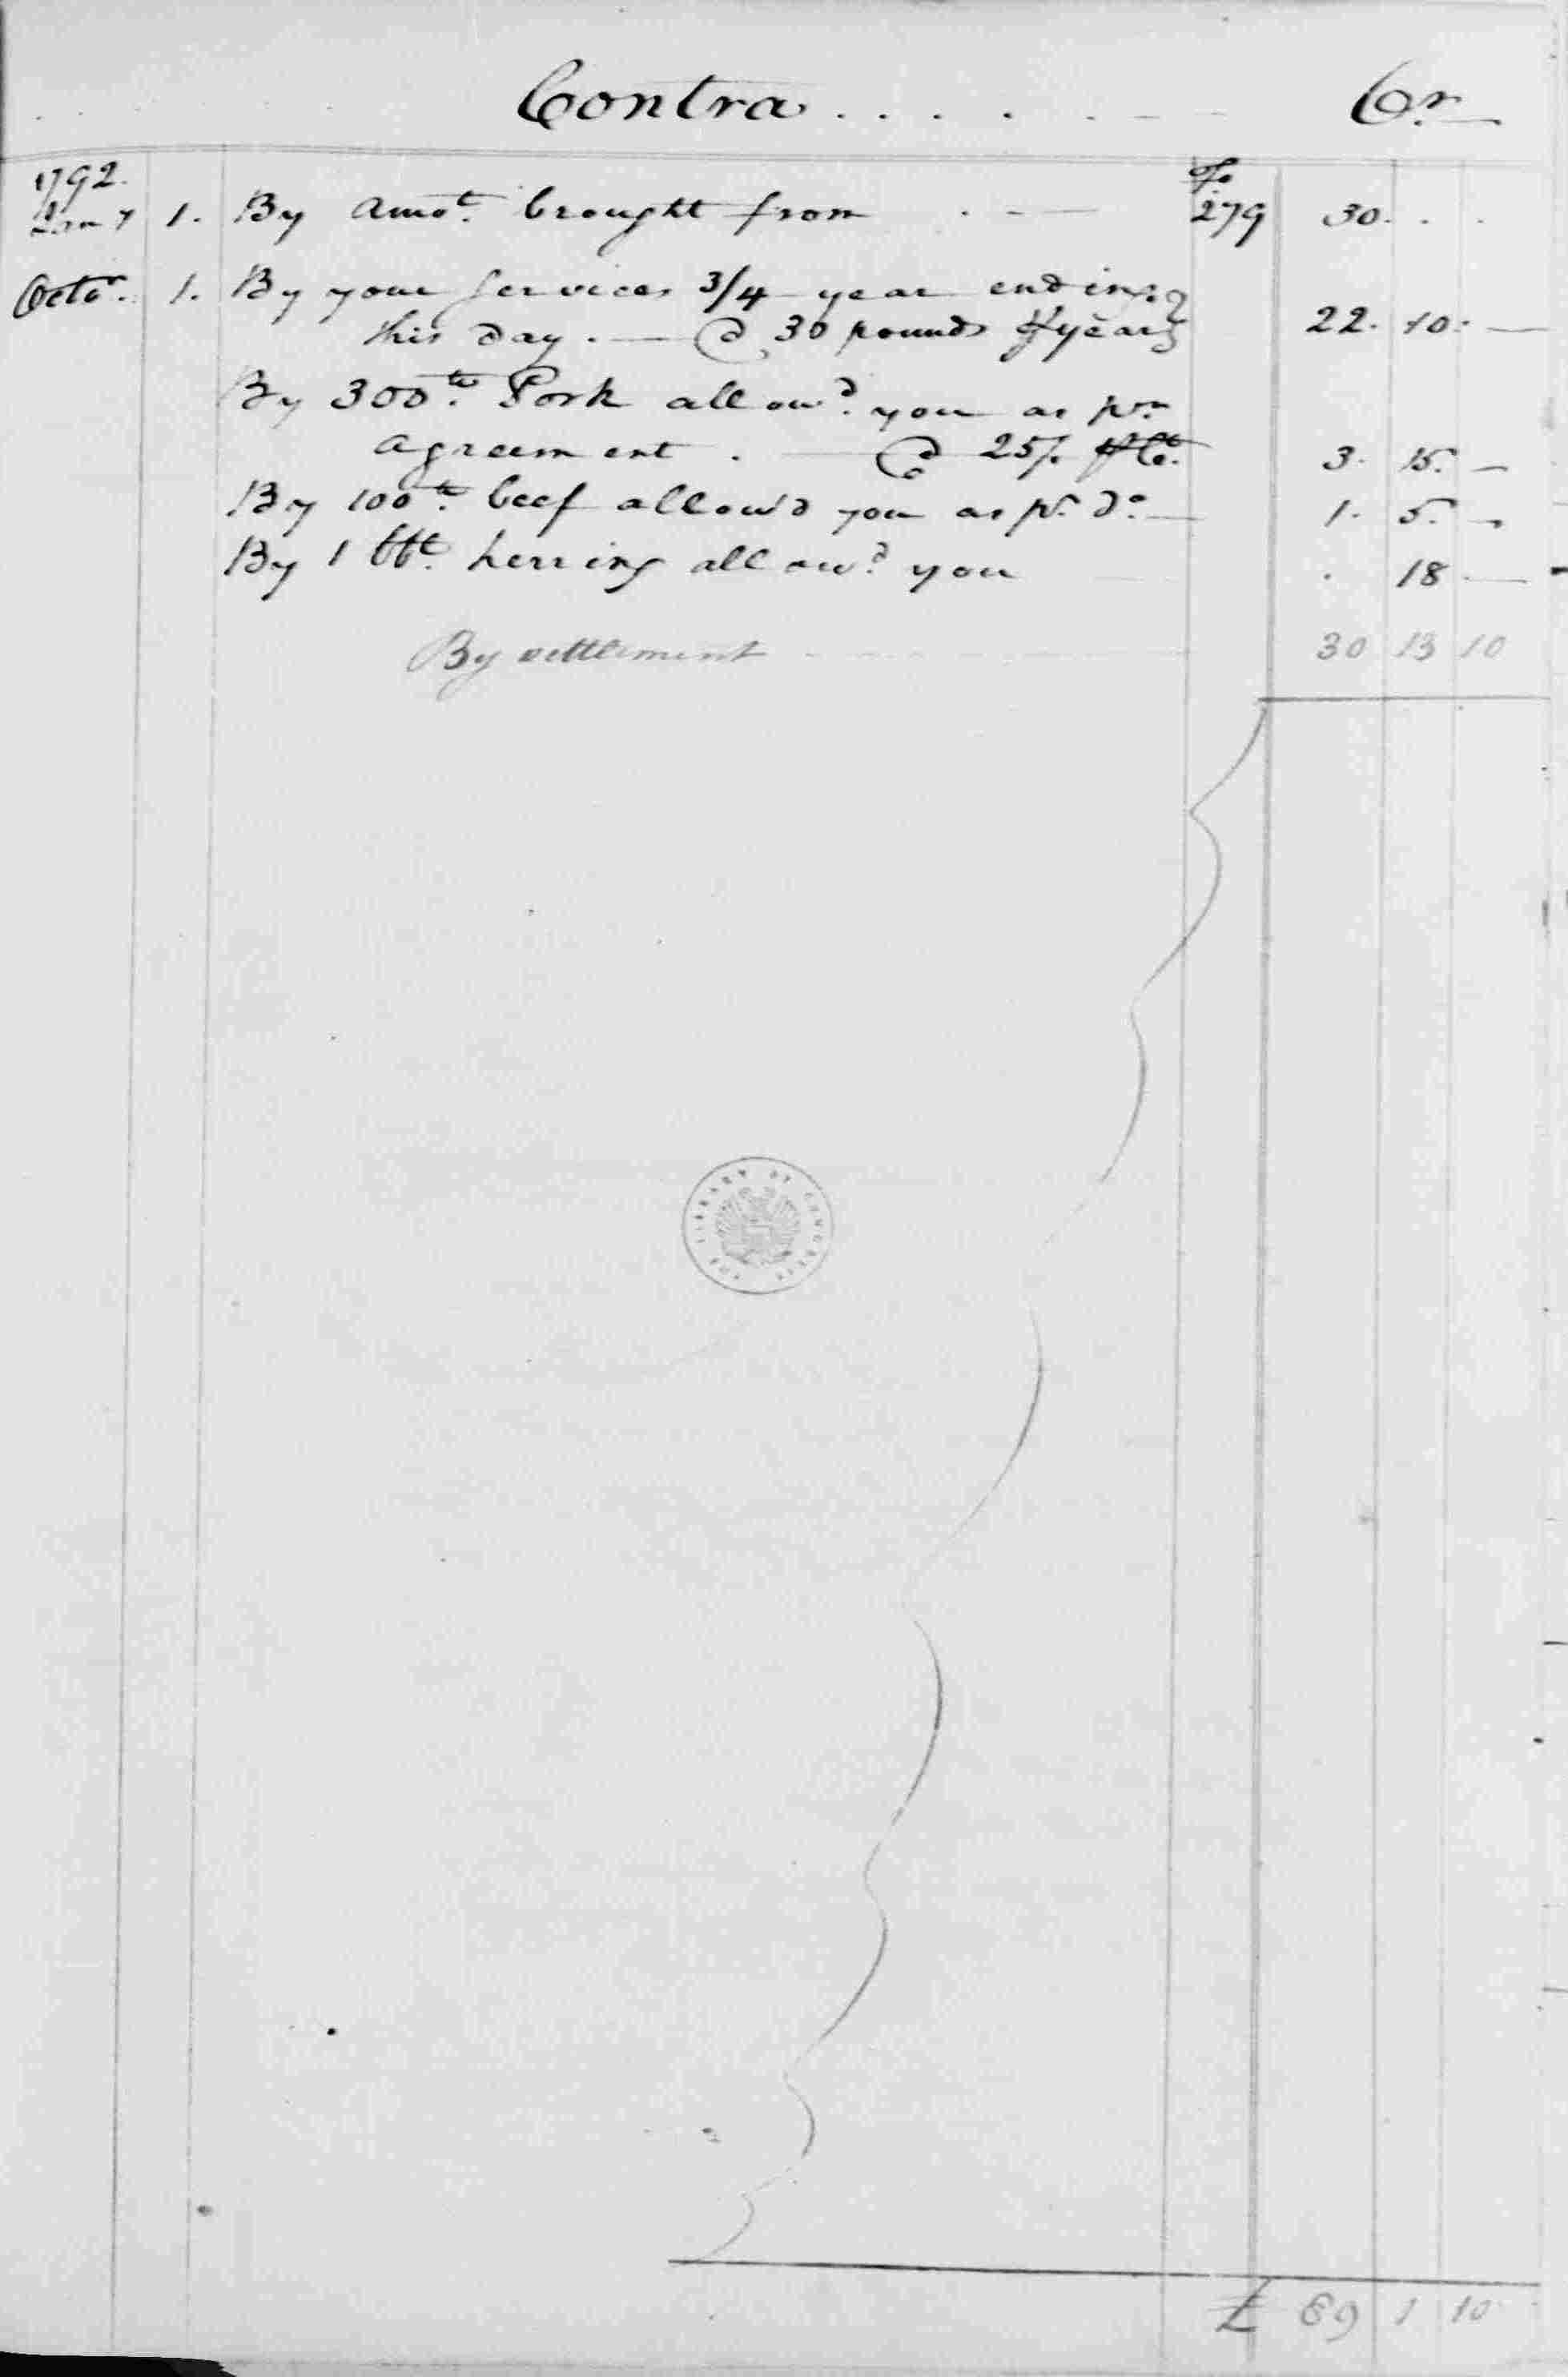 Ledger B, folio 350, right side